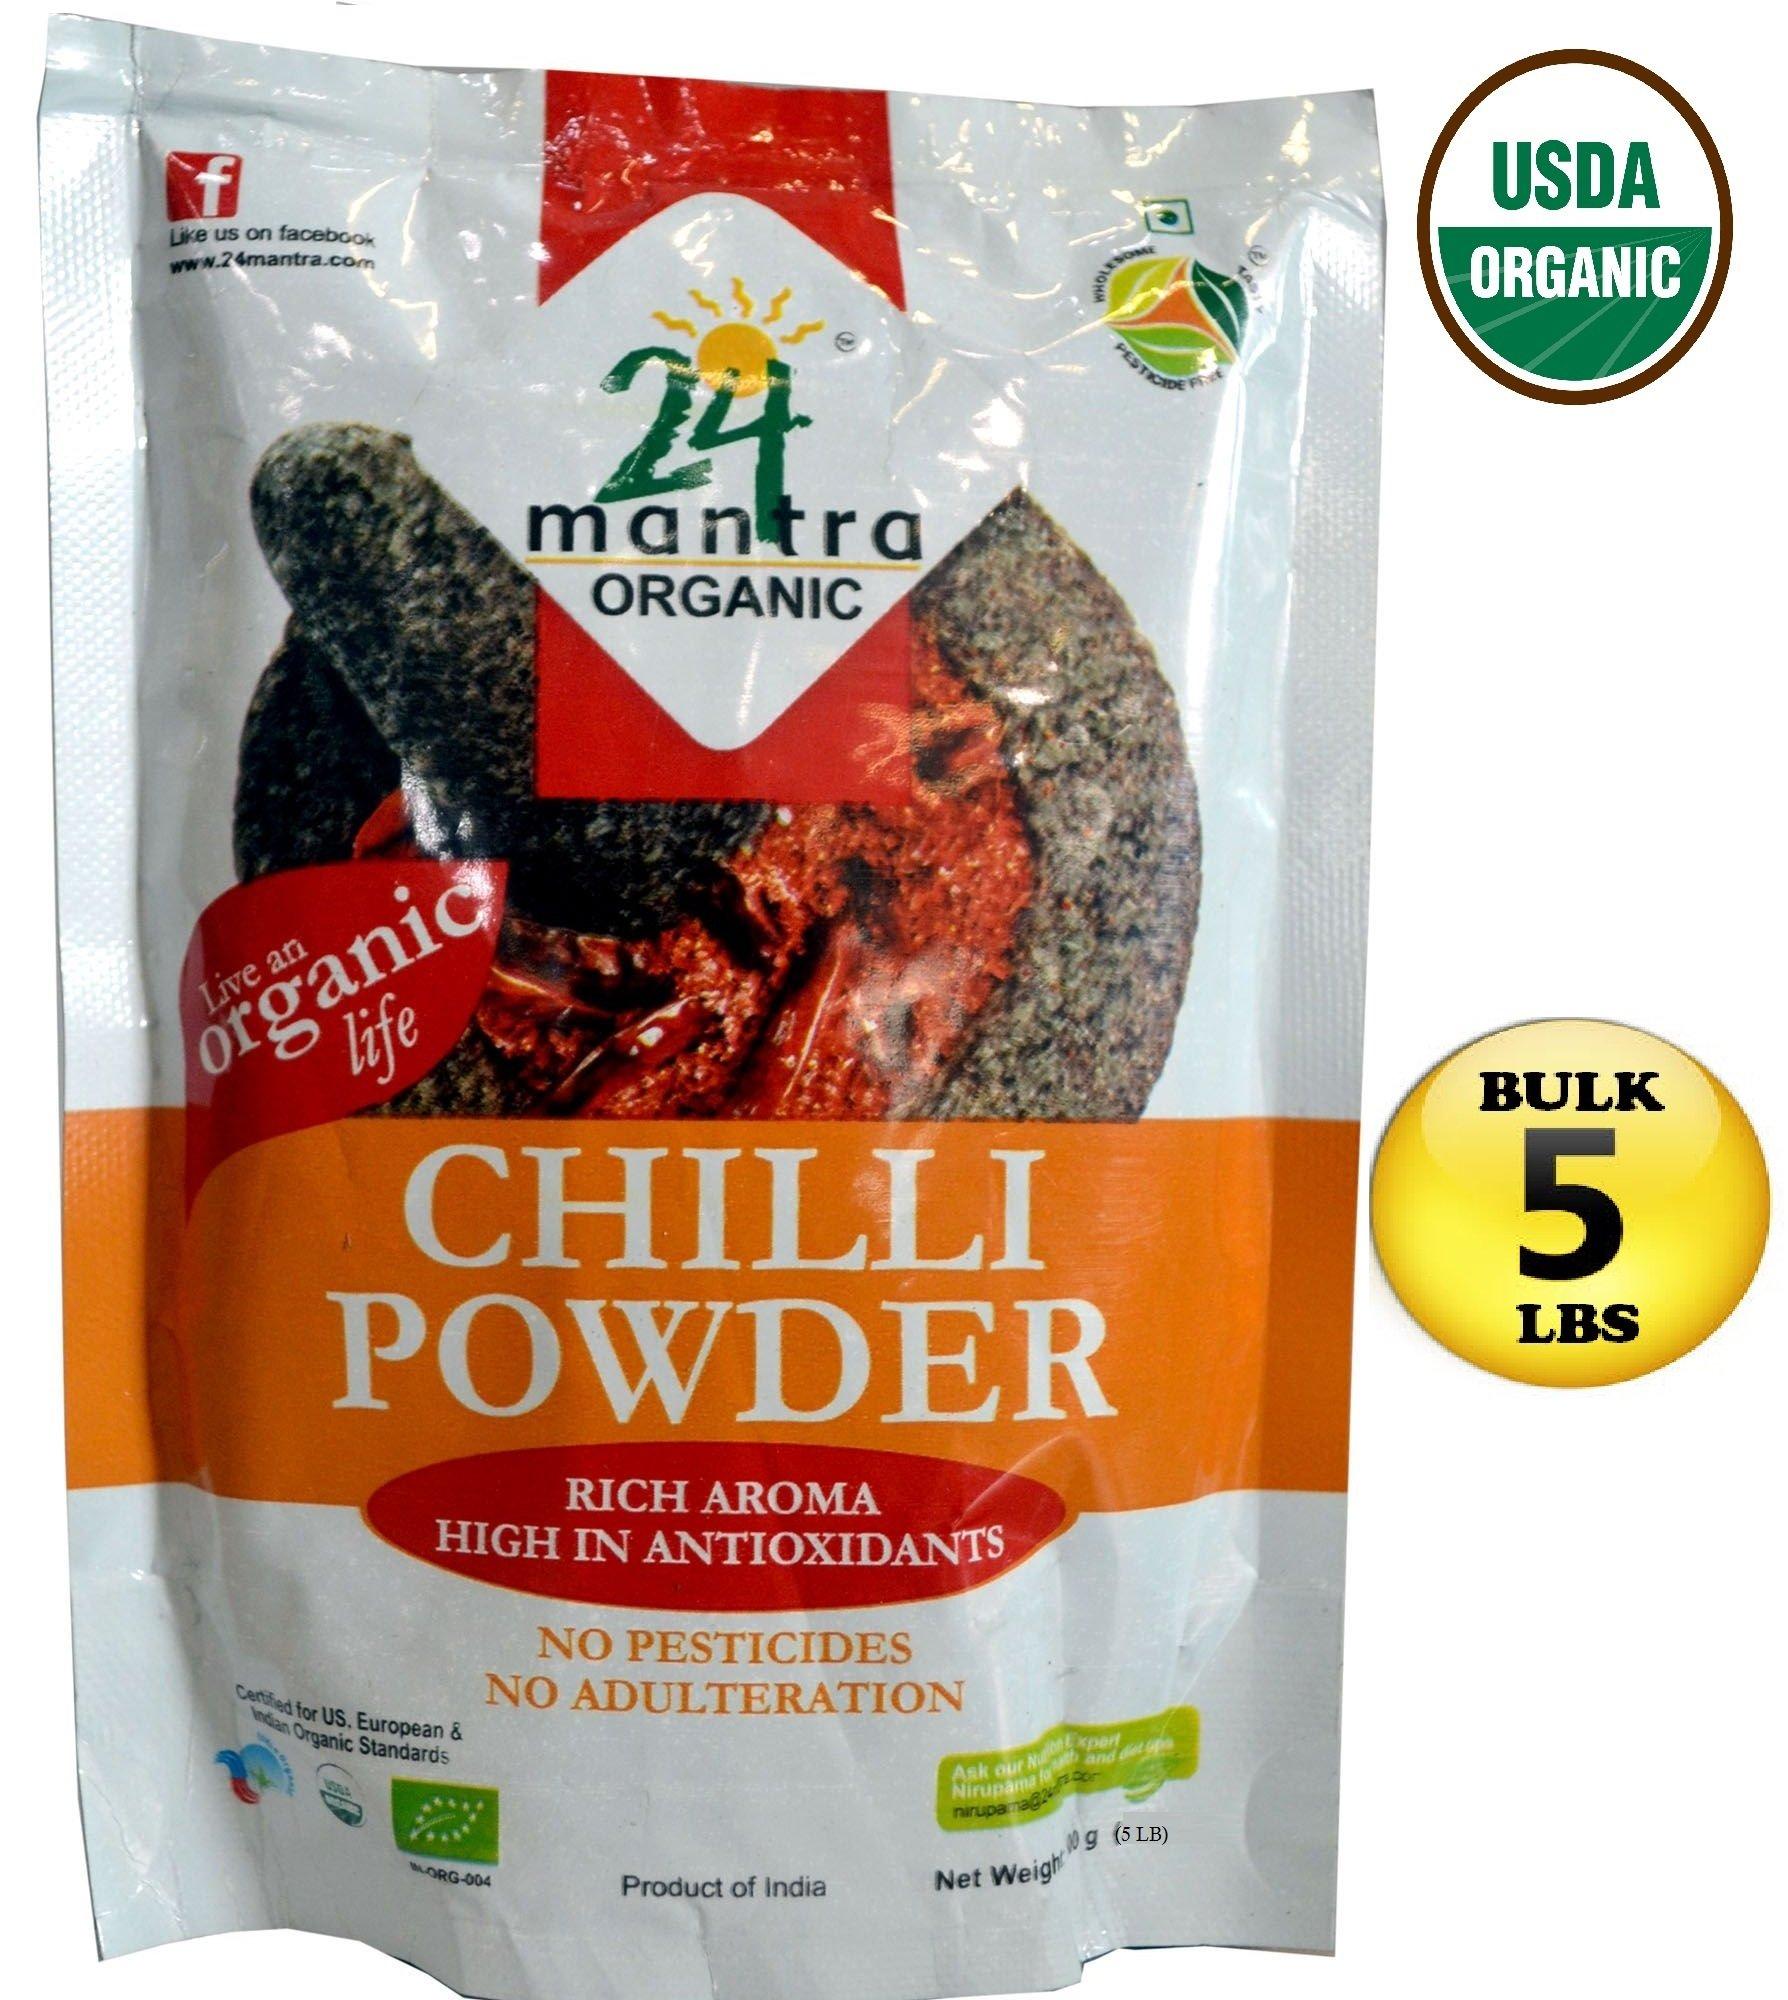 Organic Chili Powder - Chilli Powder - Bulk Size 5 LBS - USDA Certified Organic - ★ Best Price in Amazon - *** Very HOT *** - ★ Adulteration Free ★ Pesticides Free- 24 Mantra Organic